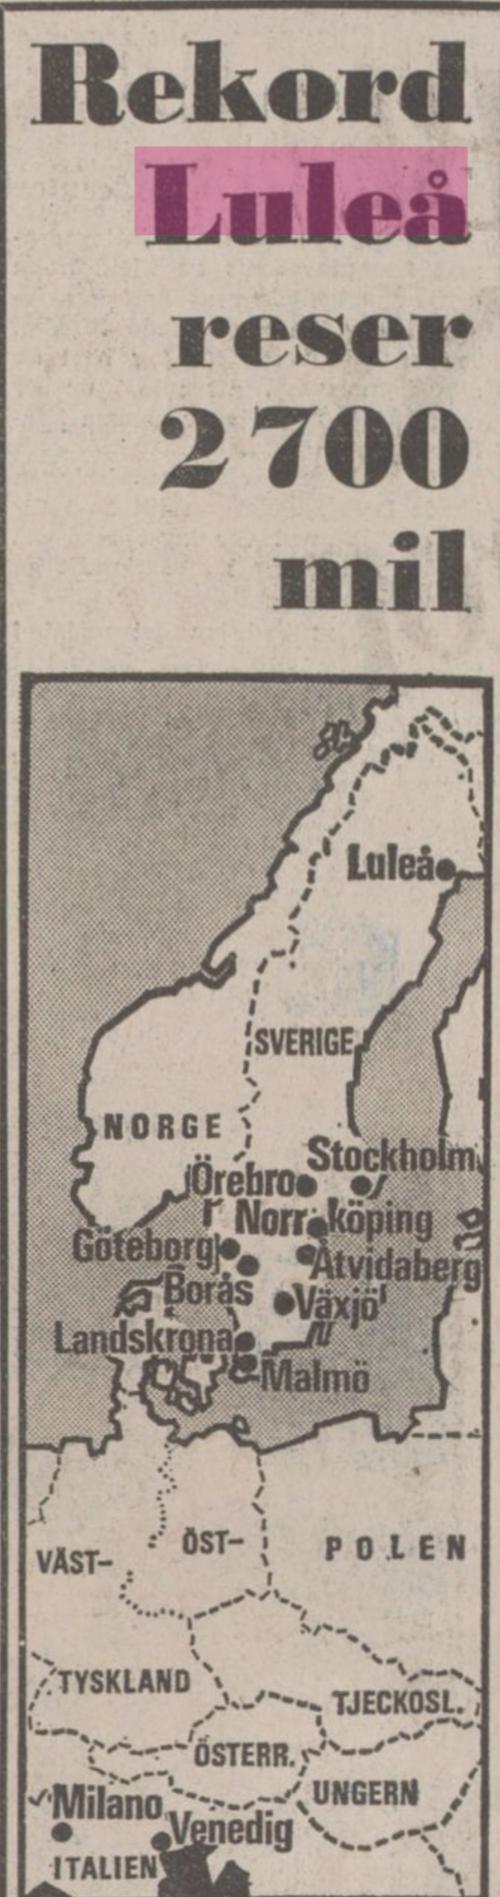 IFK Luleå - Sida 2 88518610